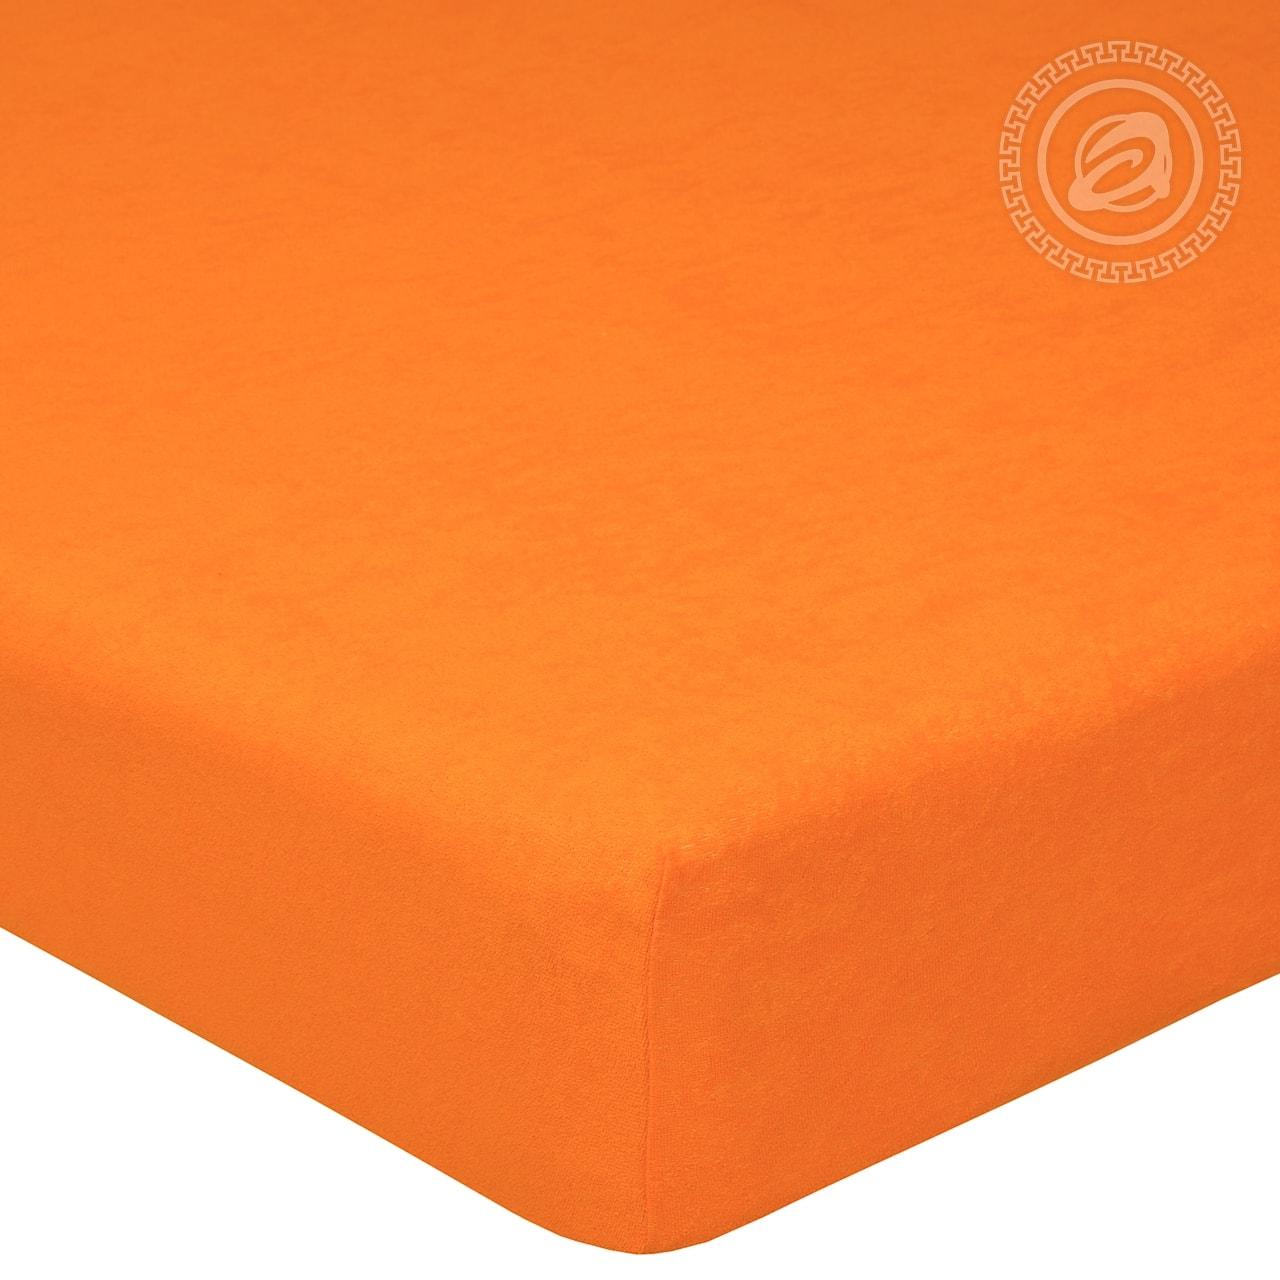 Простыня на резинке iv36220 (махра) 60х120